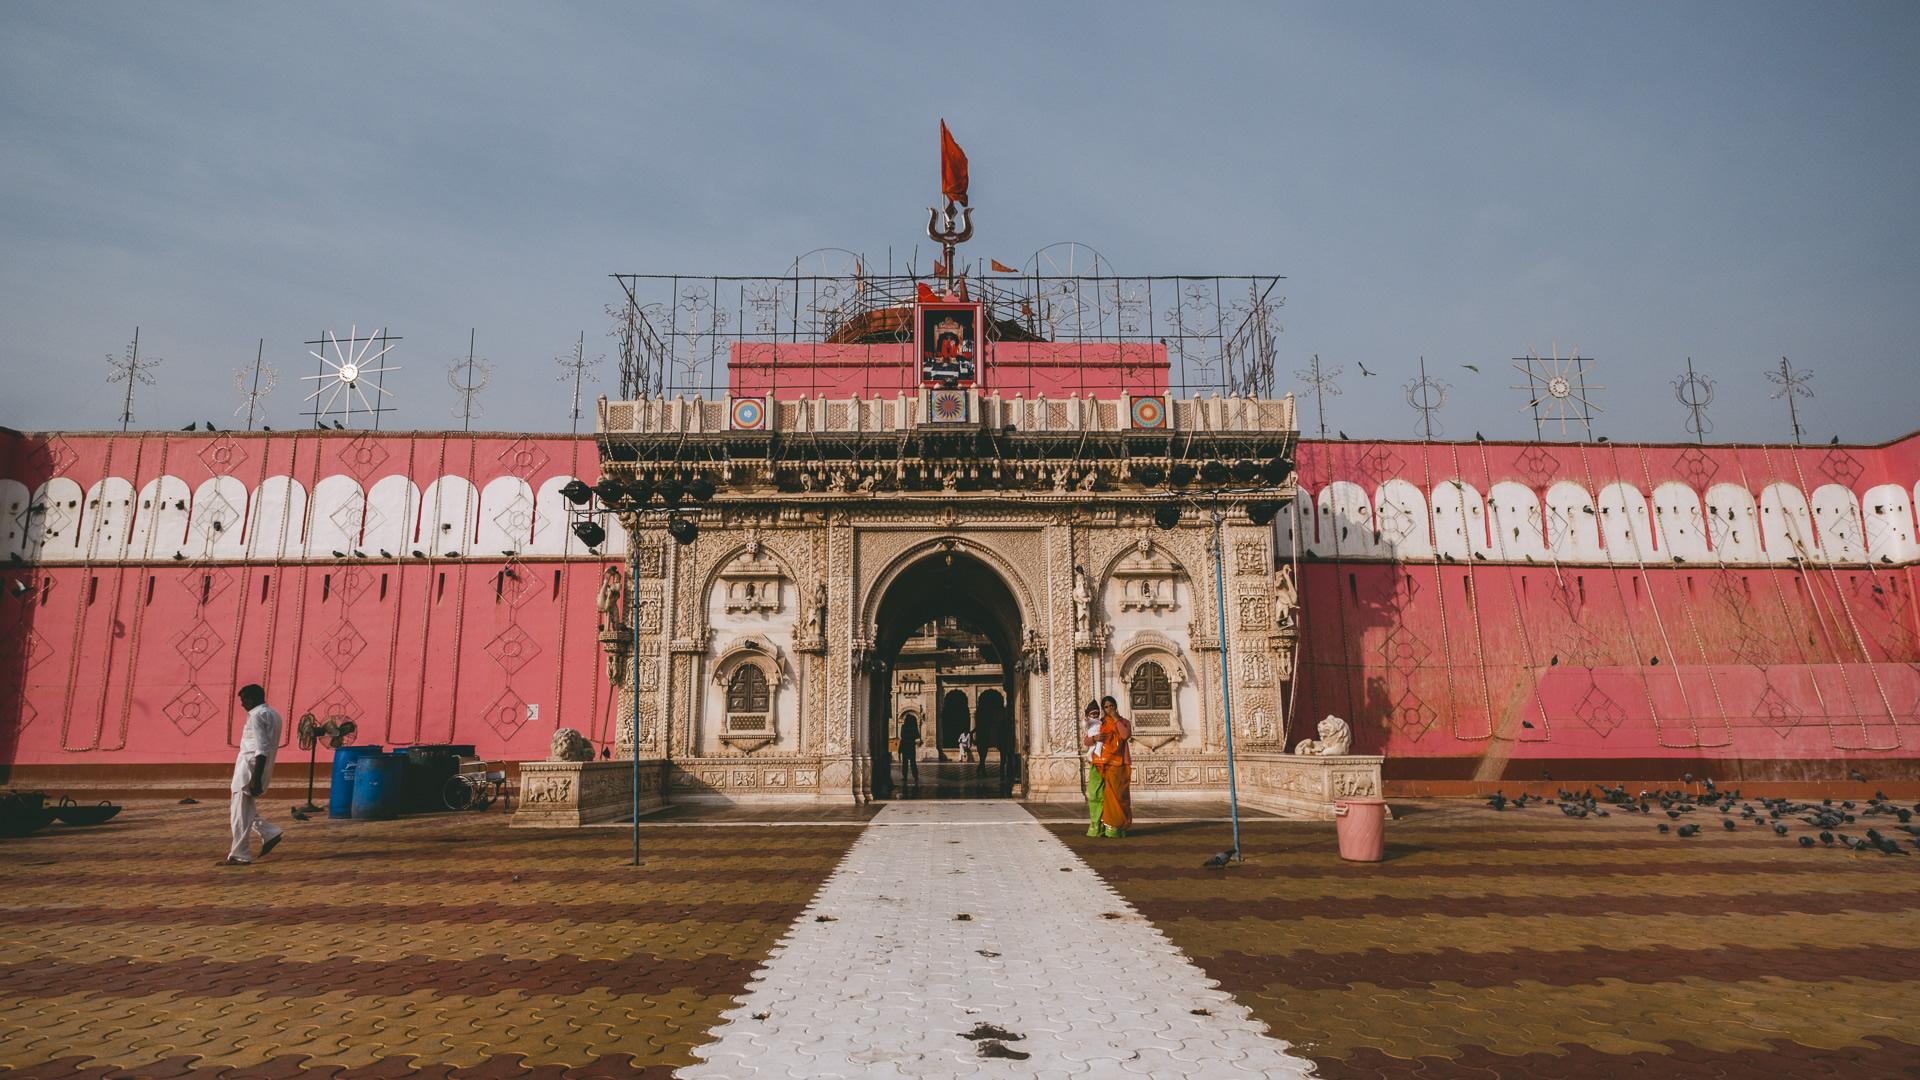 Karni Mata, Rat Temple, Rajasthan, India, Travel photography, Nathan Brayshaw